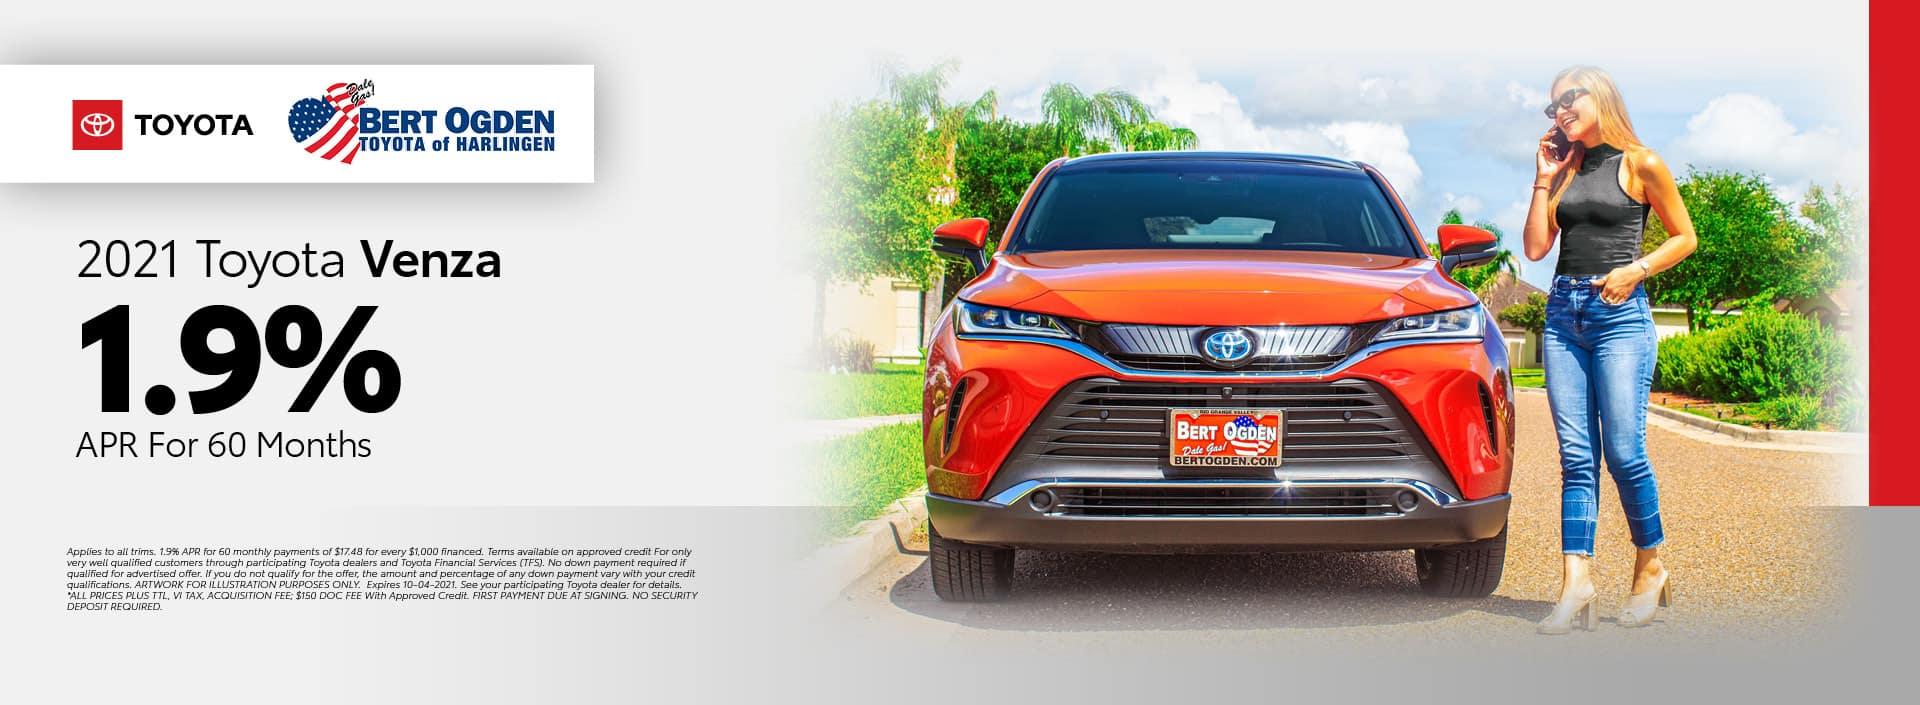 2021 Toyota Venza APR Offer | Bert Ogden Toyota in Harlingen, Texas